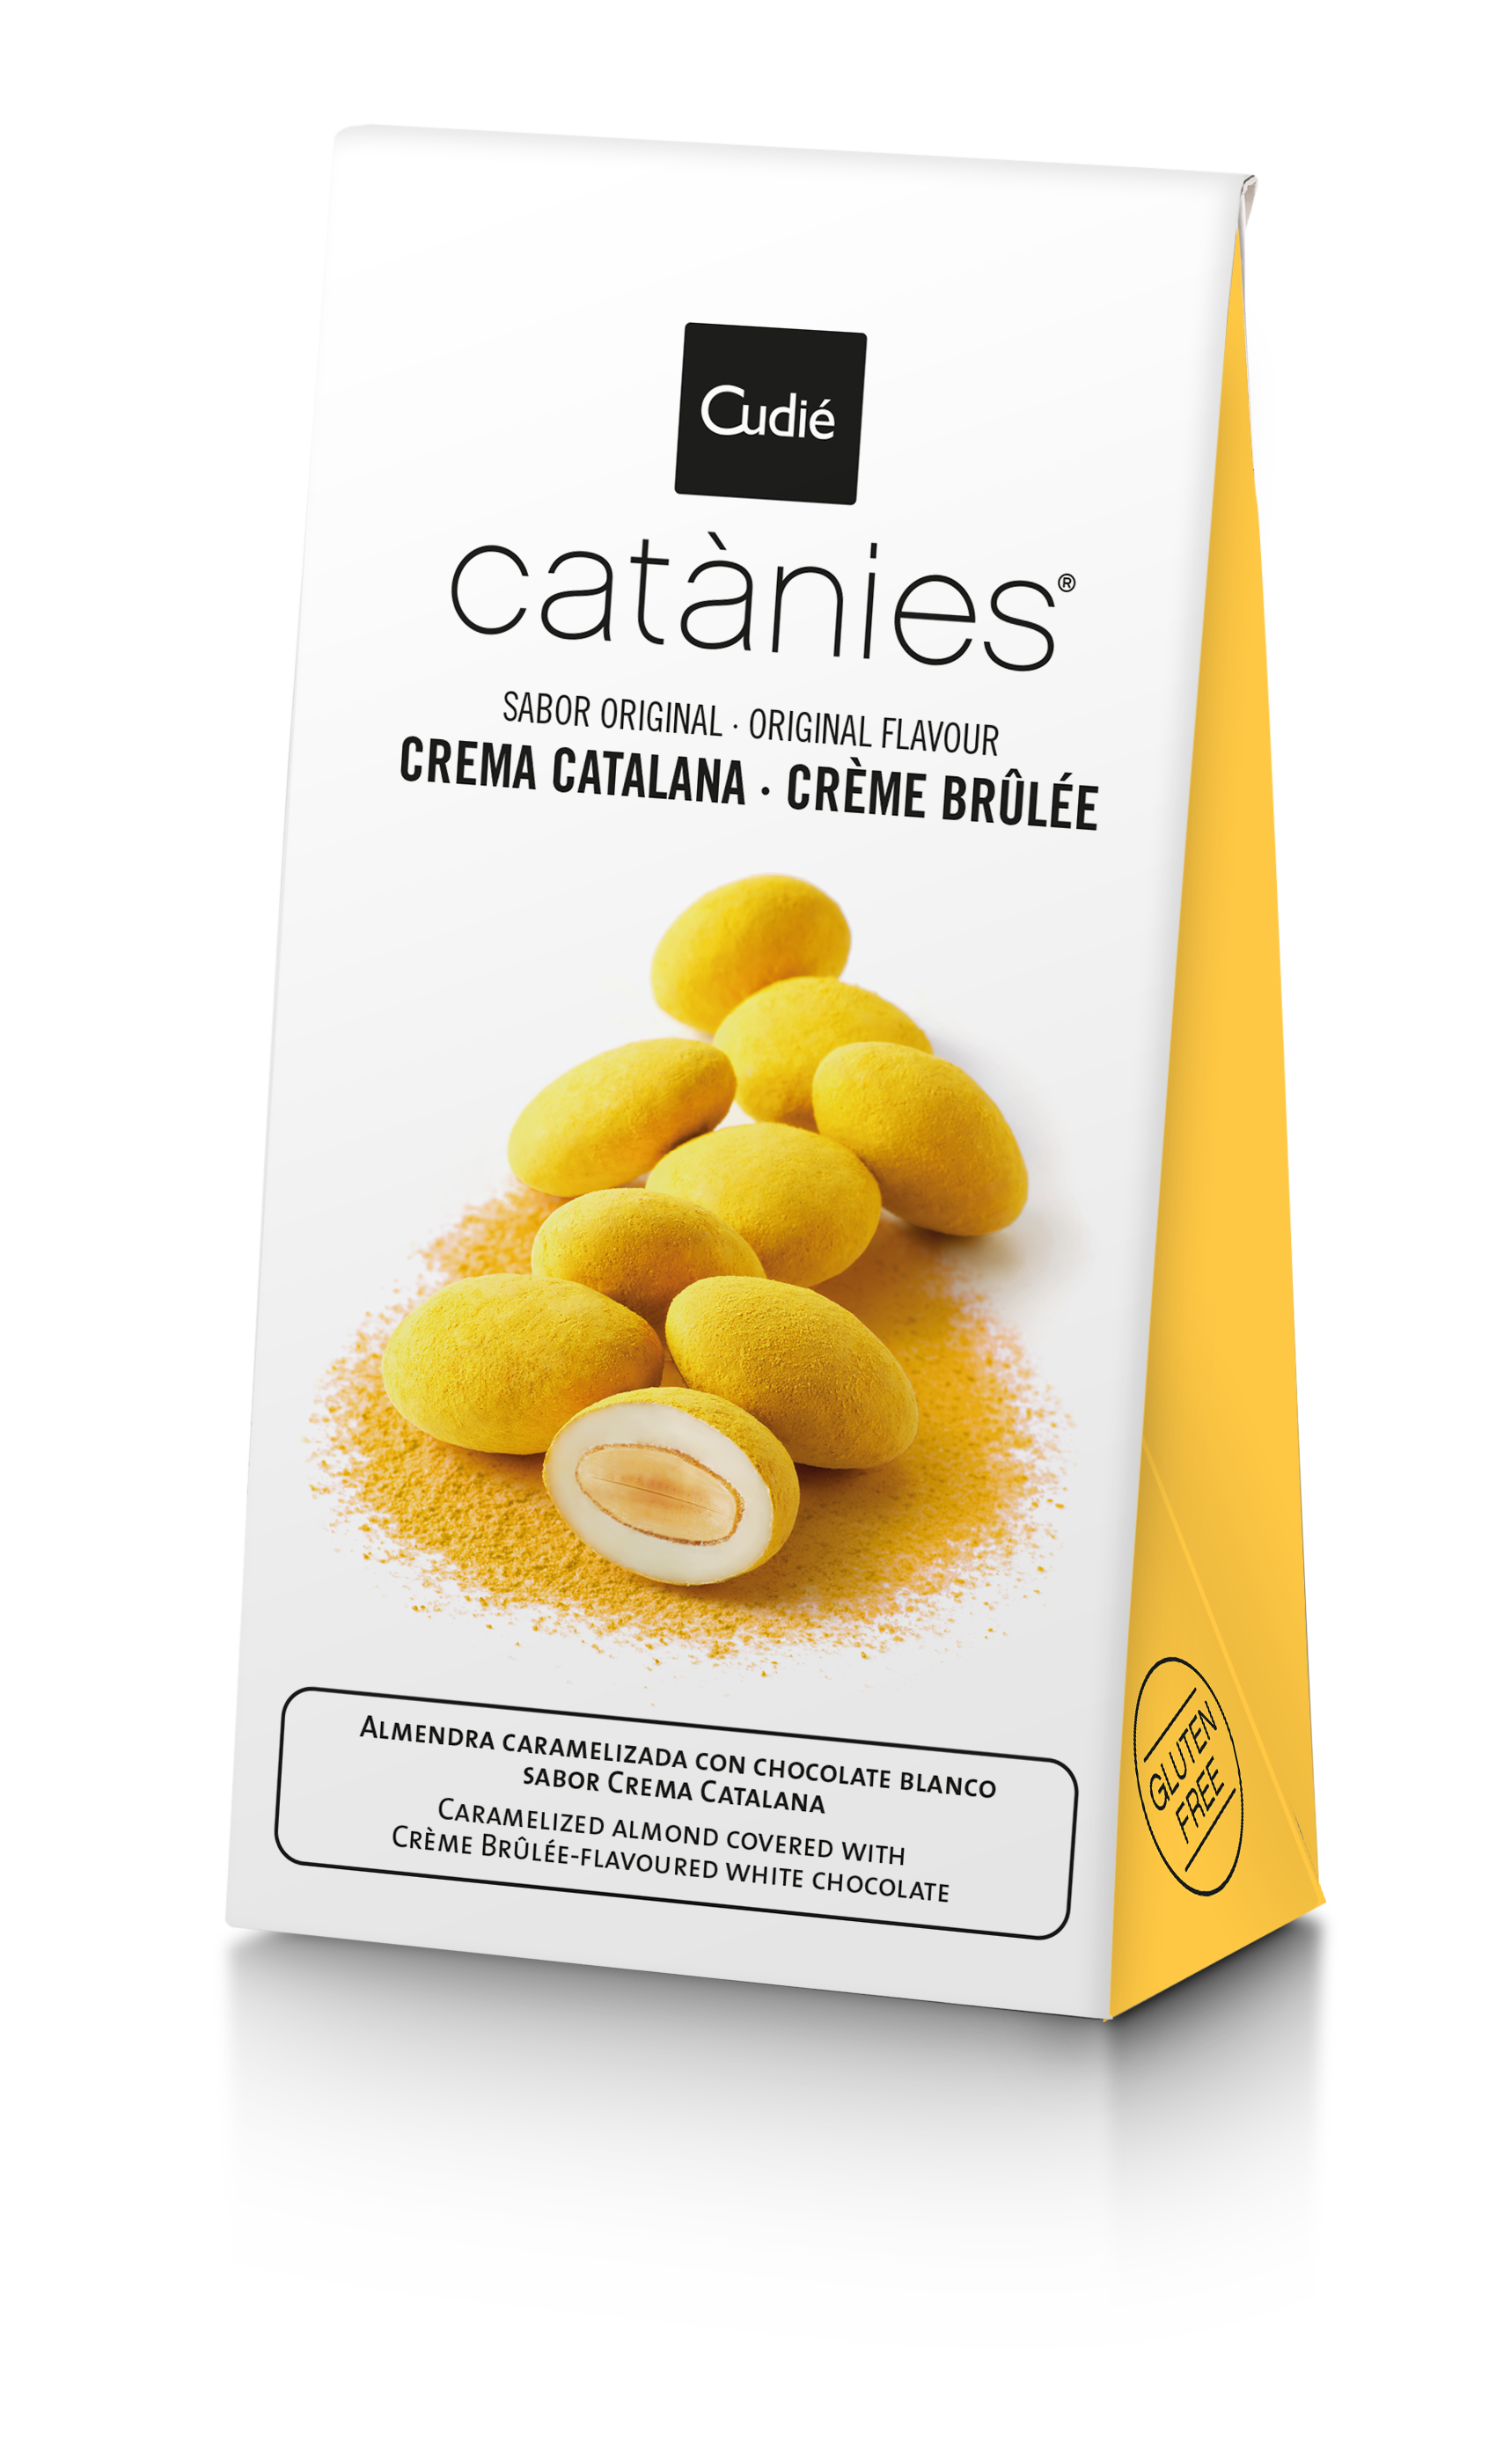 Catànies Crema Catalana (Crème Brûlée)  80g Packung